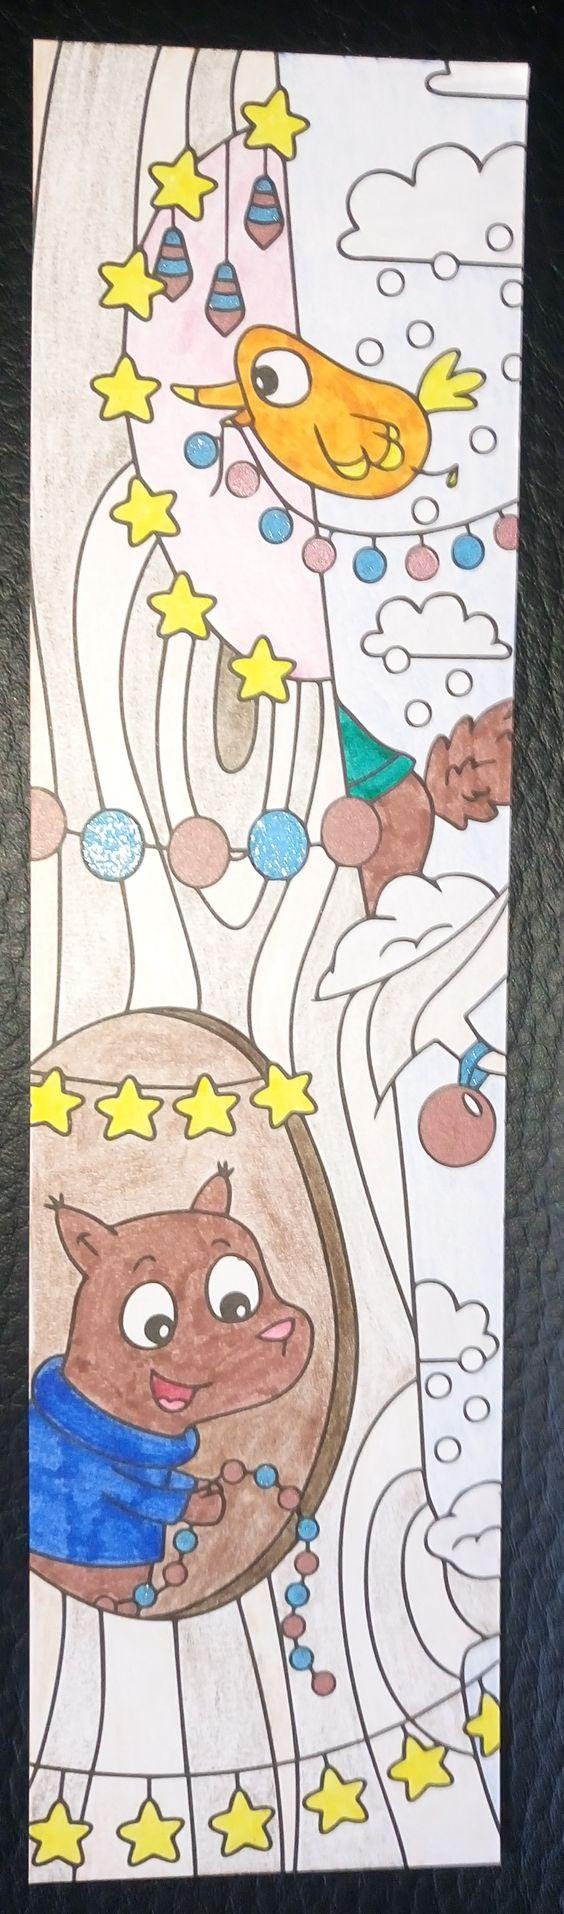 Colouring Mes marque-pages a colorier vive noel Arbol